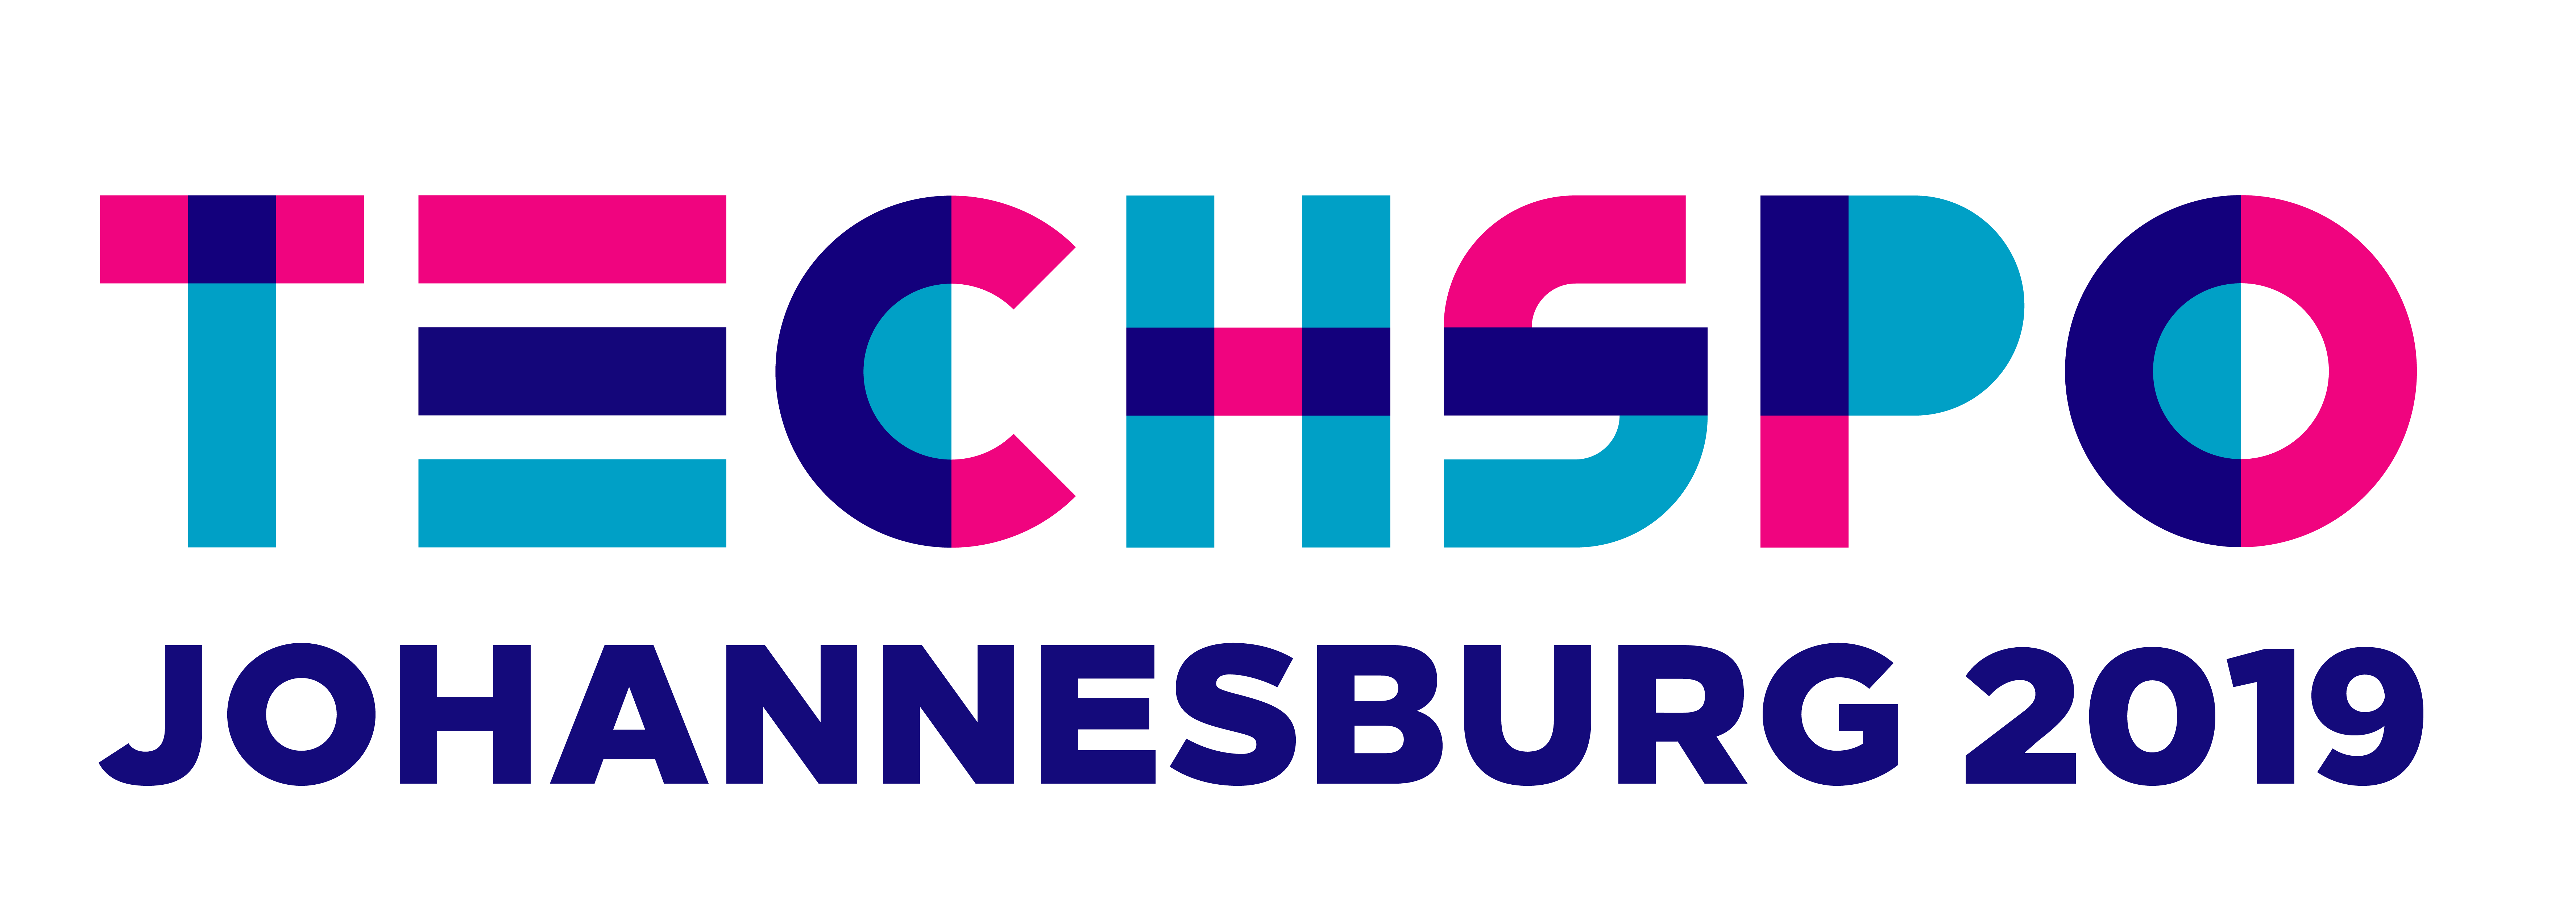 TECHSPO Johannesburg 2020